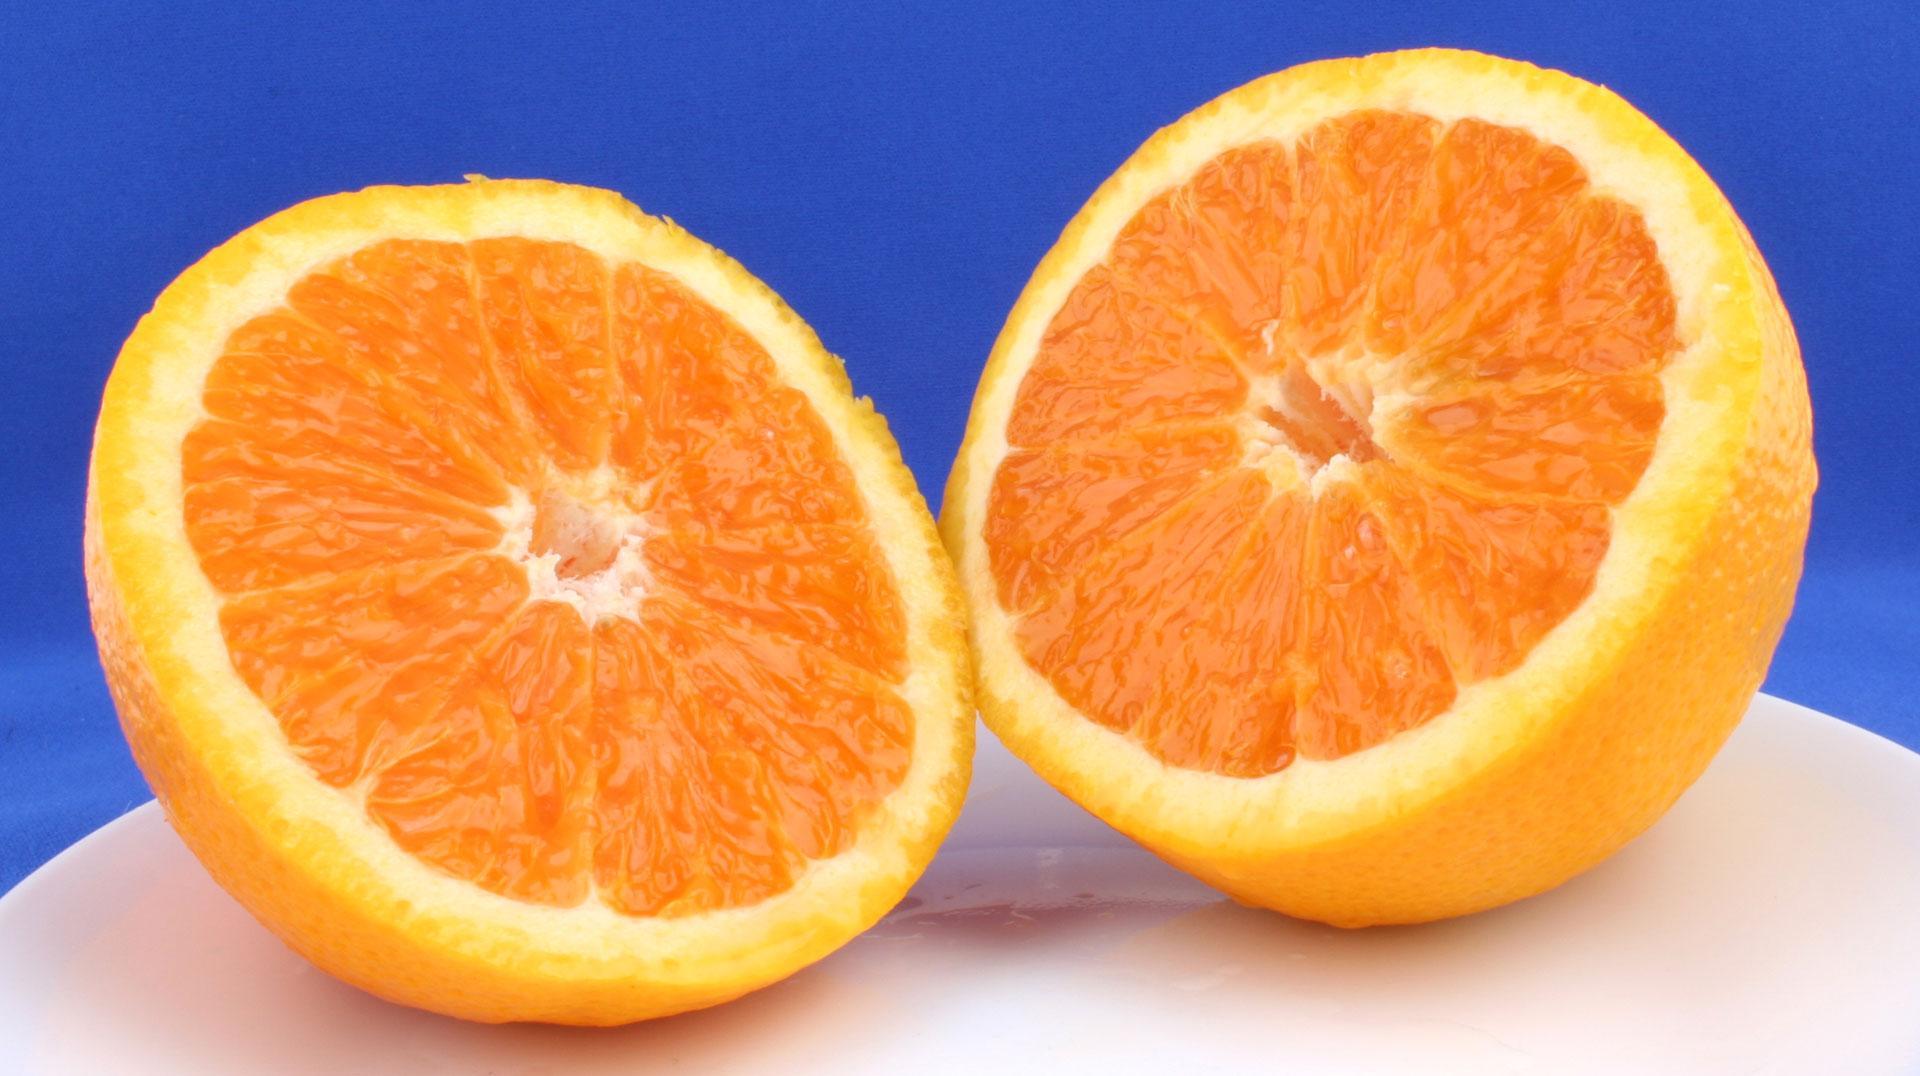 Incorporating Orange in the Decor